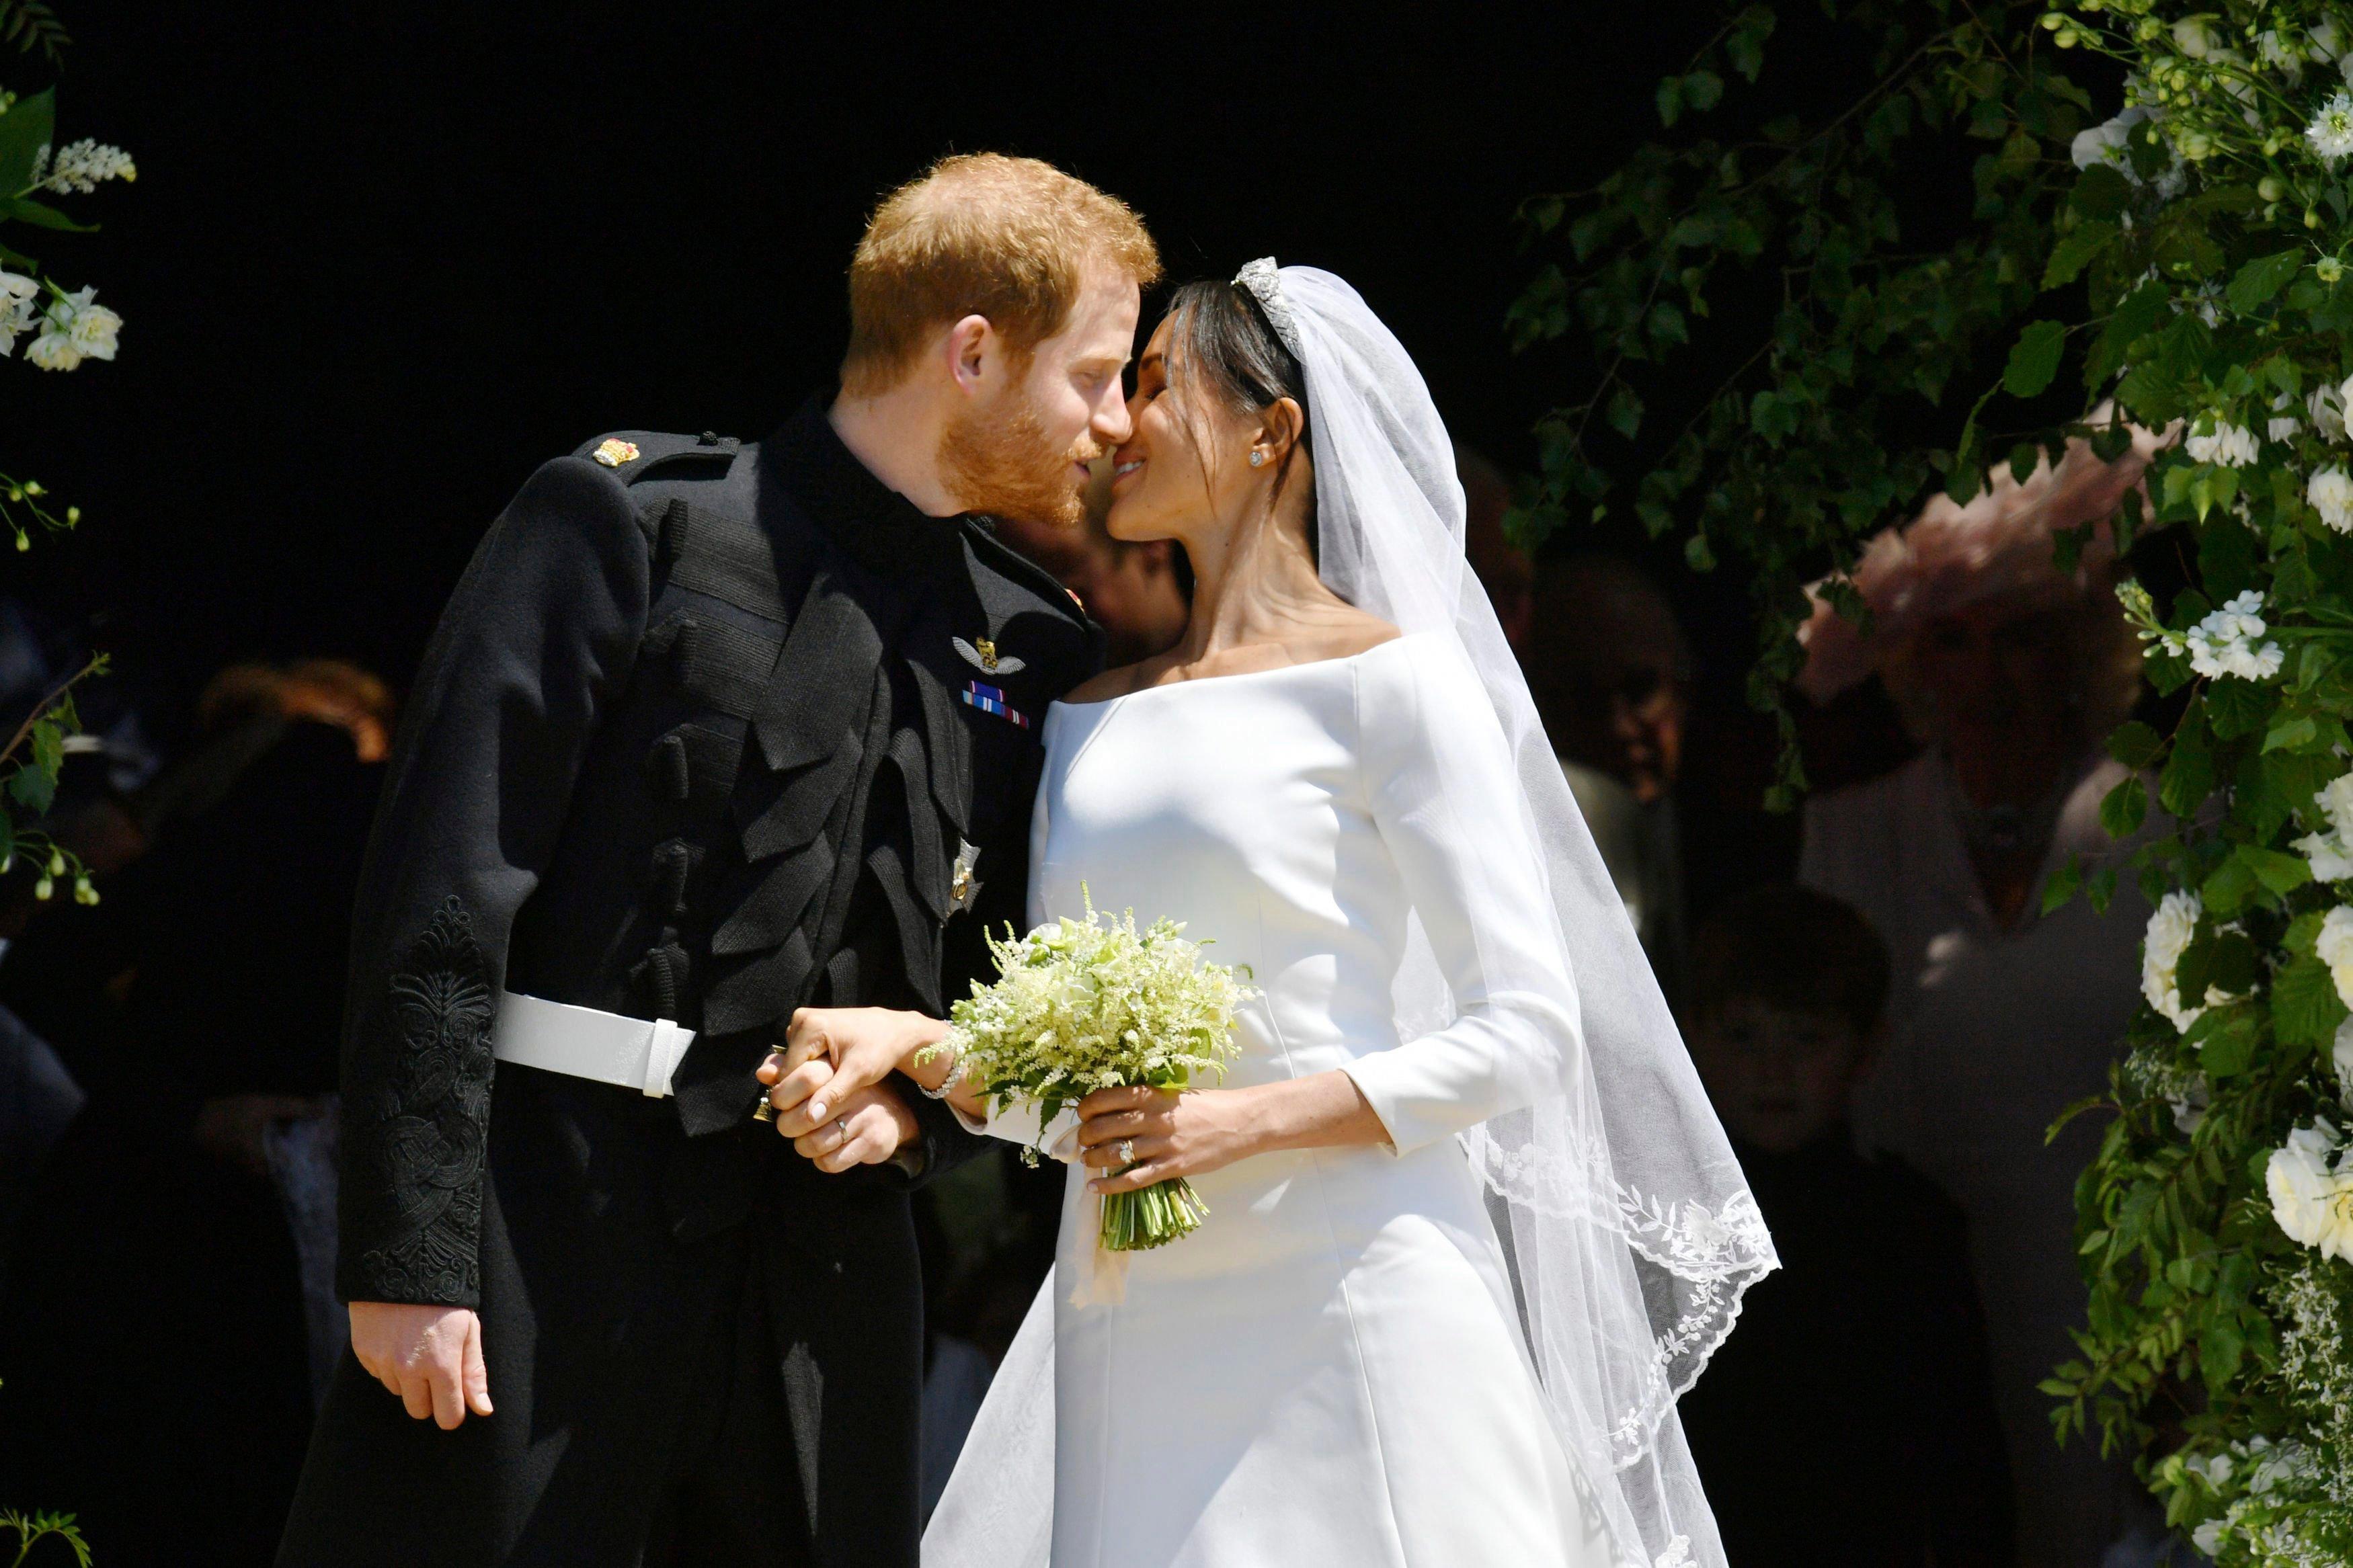 Prince Harry Wedding.The Extraordinary Wedding Of Prince Harry And Meghan Markle